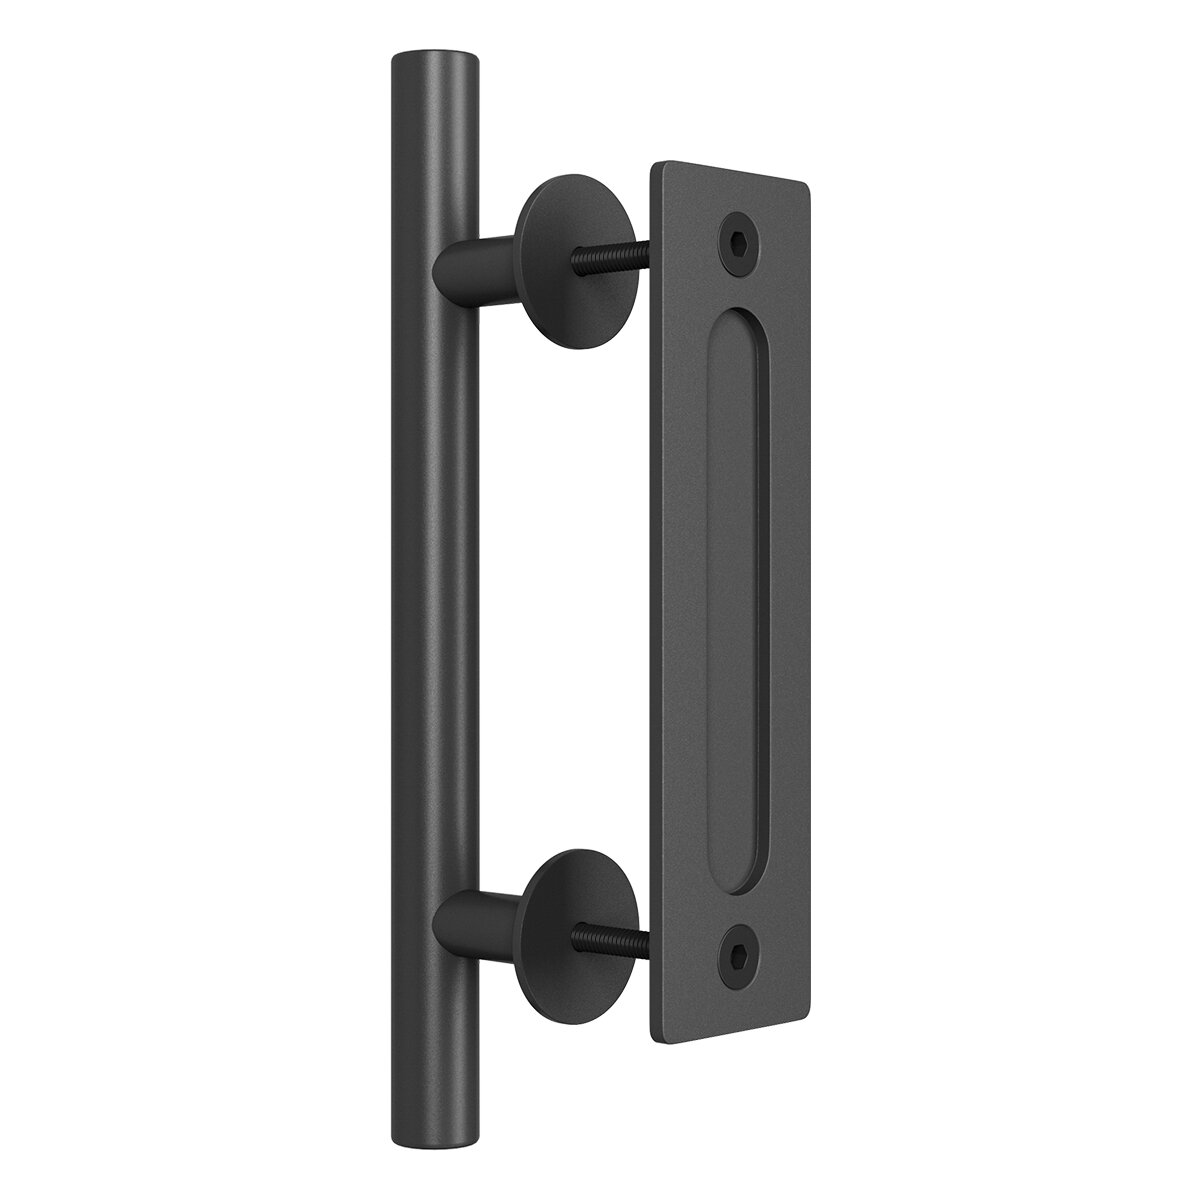 Two Side Door handle Pull Handle Set for Sliding Closet Gate Barn Door Hardware